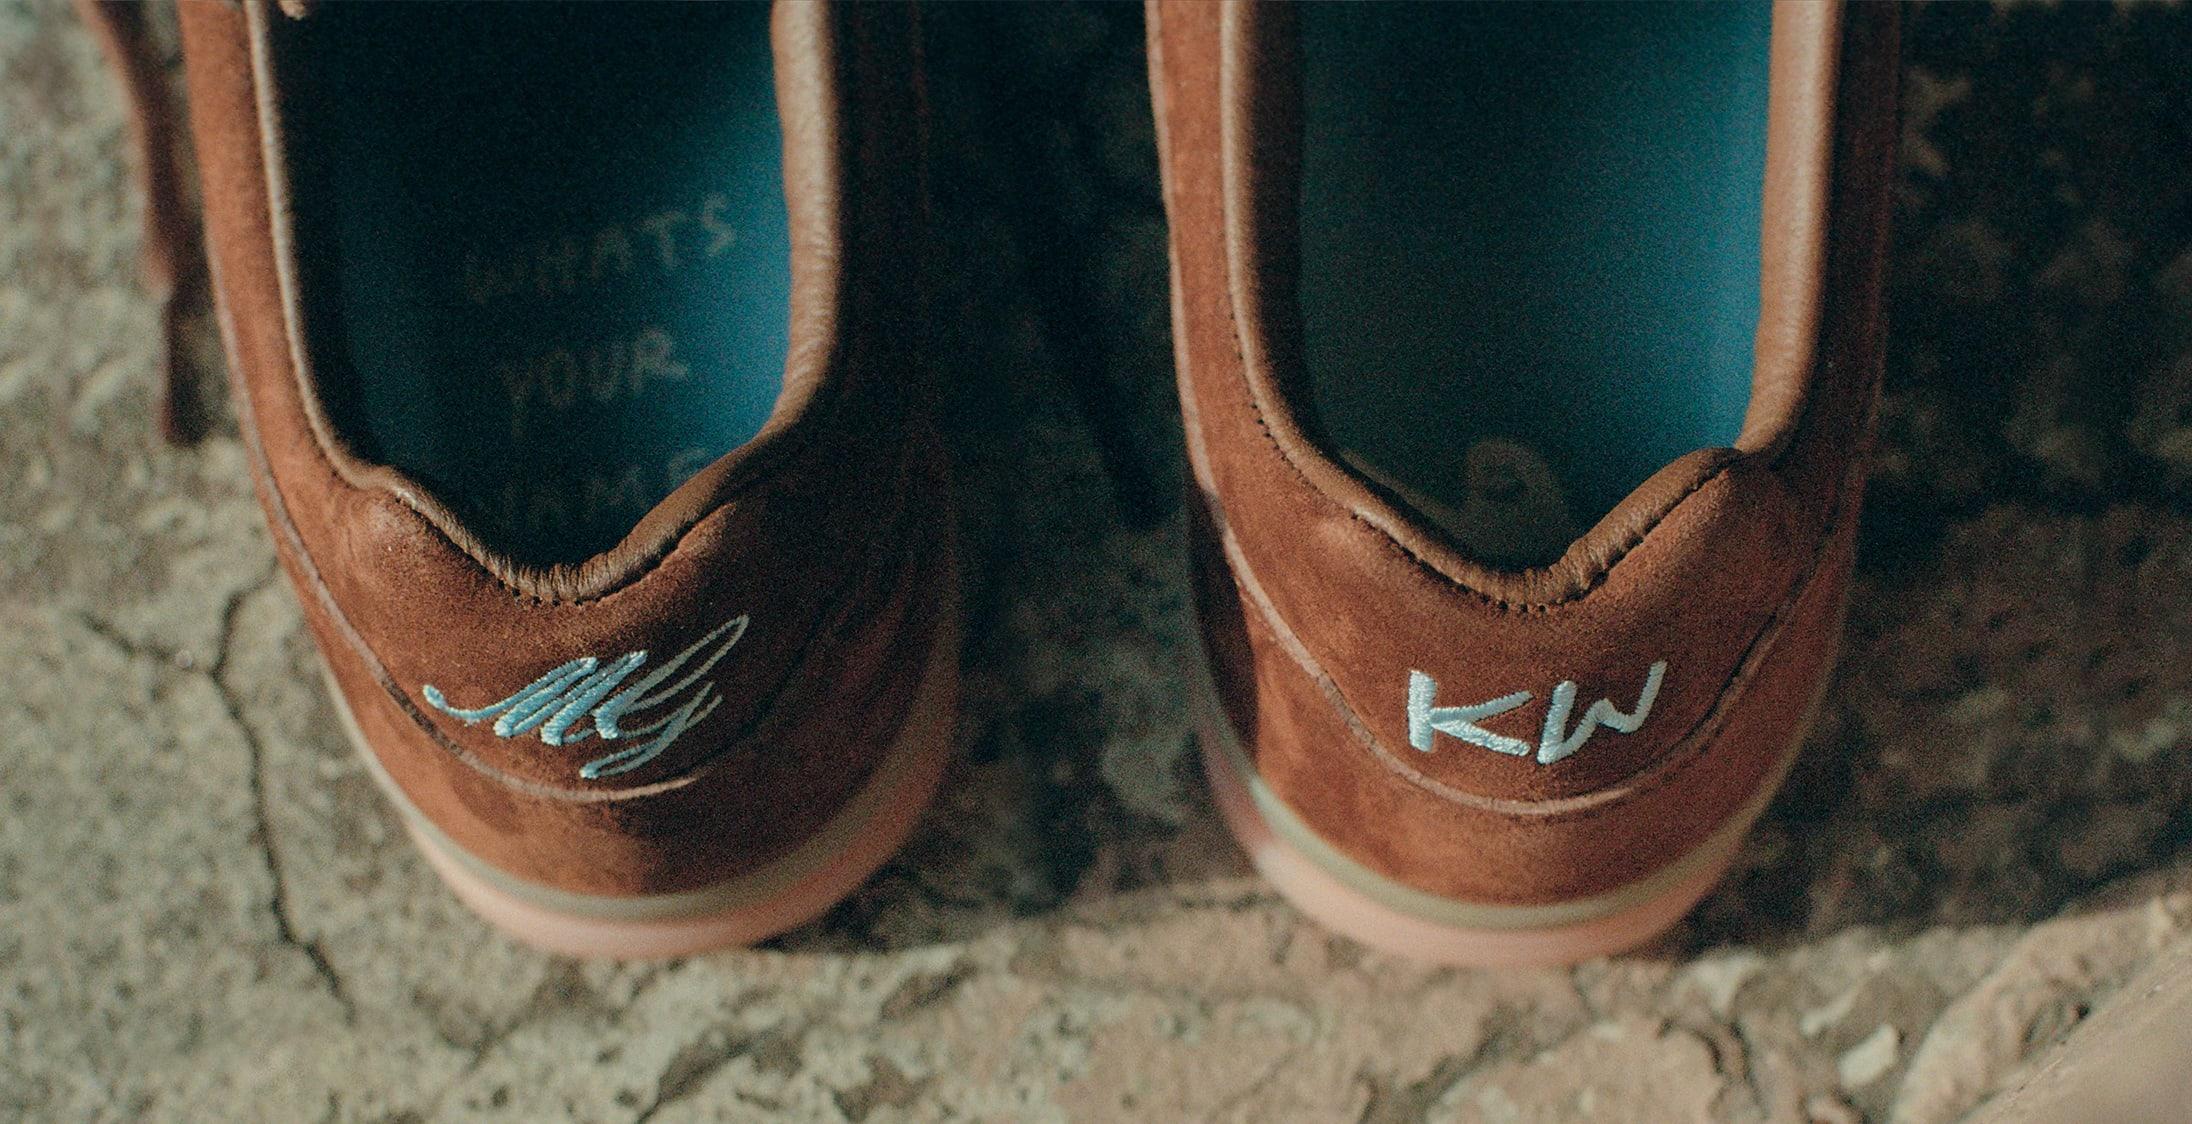 Adidas Alpha Super 'Karol Winthorp' Heel